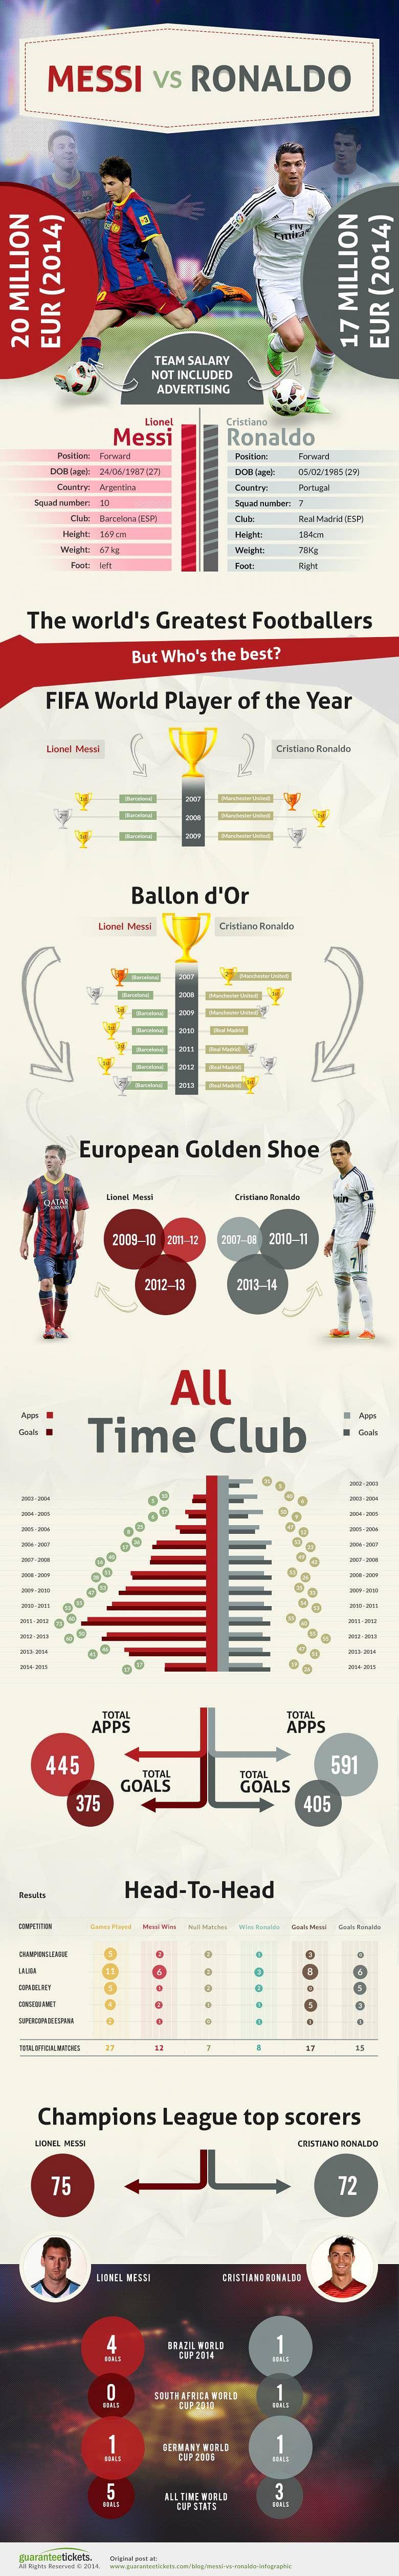 Infographic: Comparing the legends - Lionel Messi and Cristiano Ronaldo